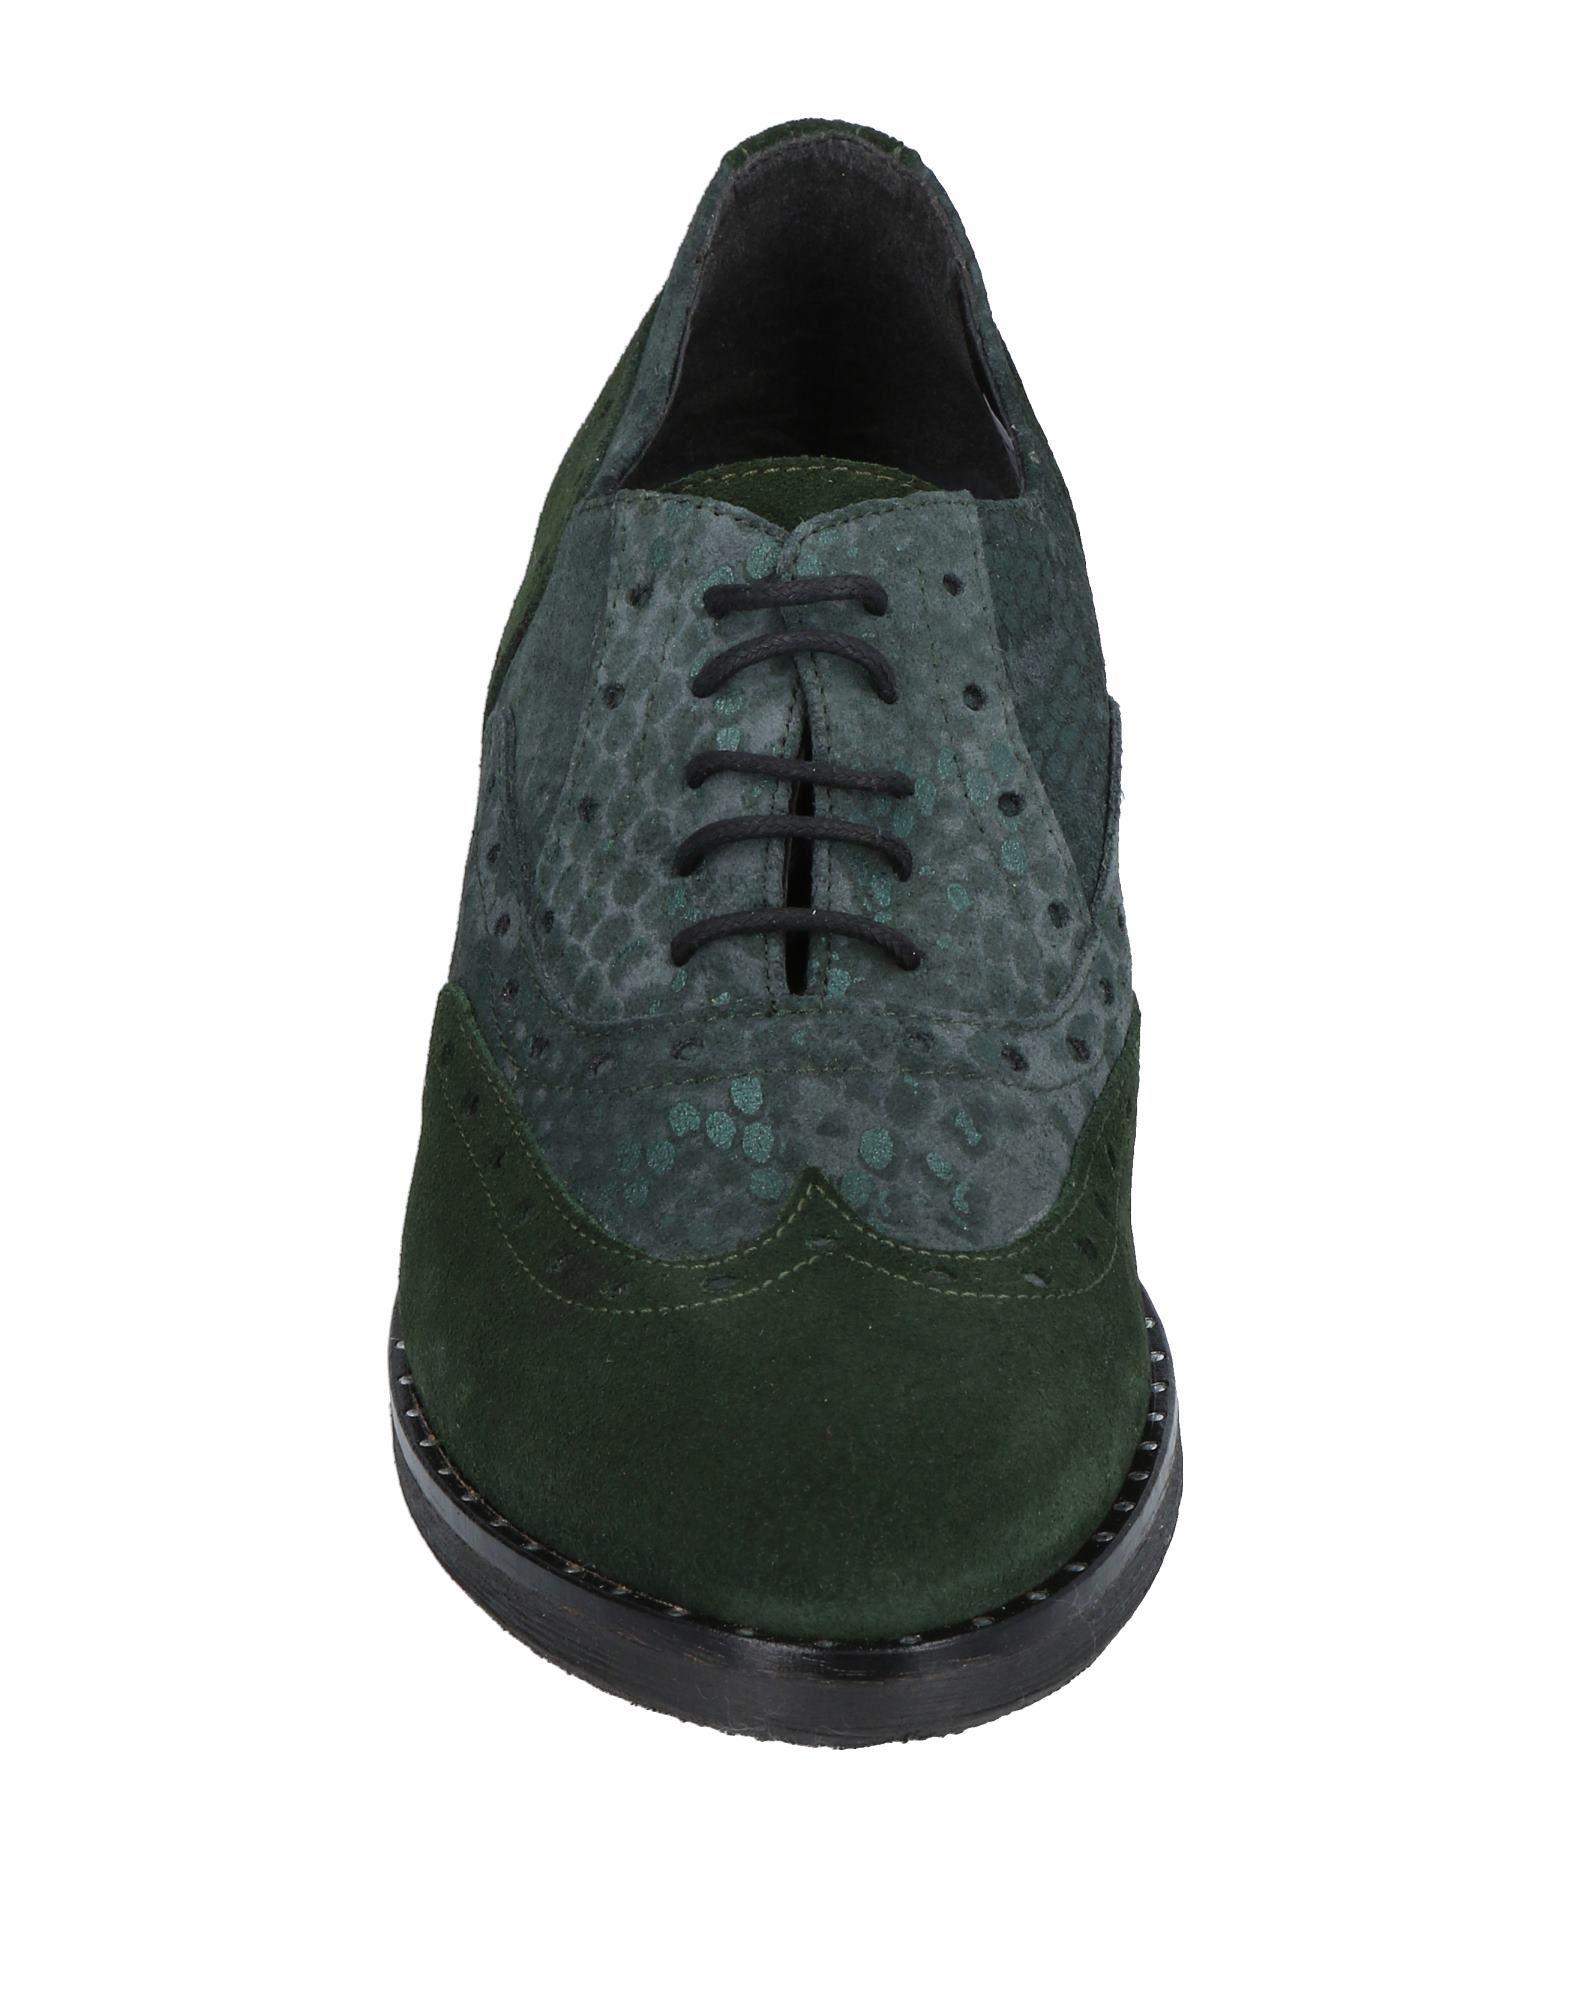 Chaussures - Tribunaux Tsd12 aiIP7kkR